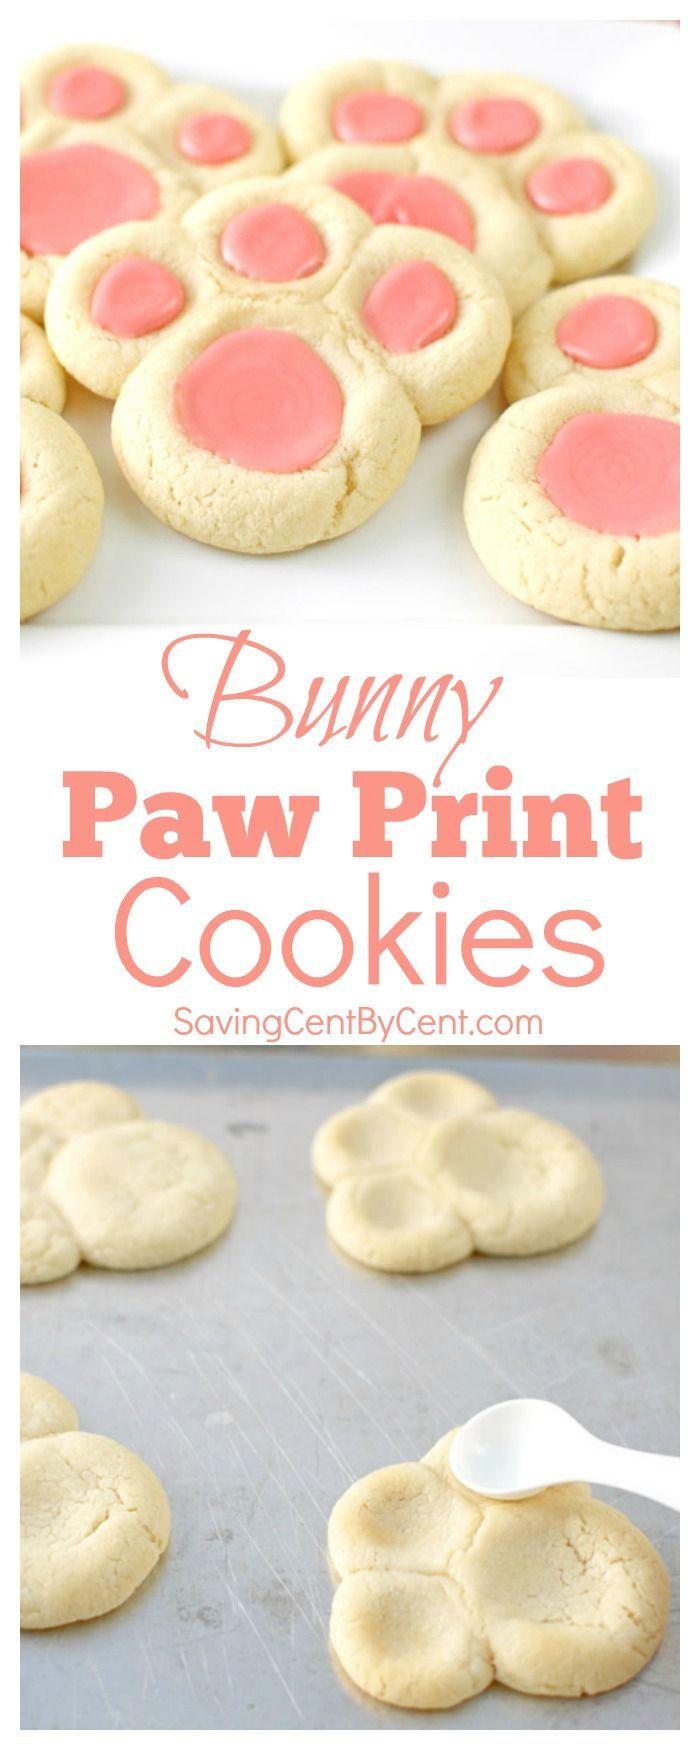 Photo of Bunny Paw Print Cookies